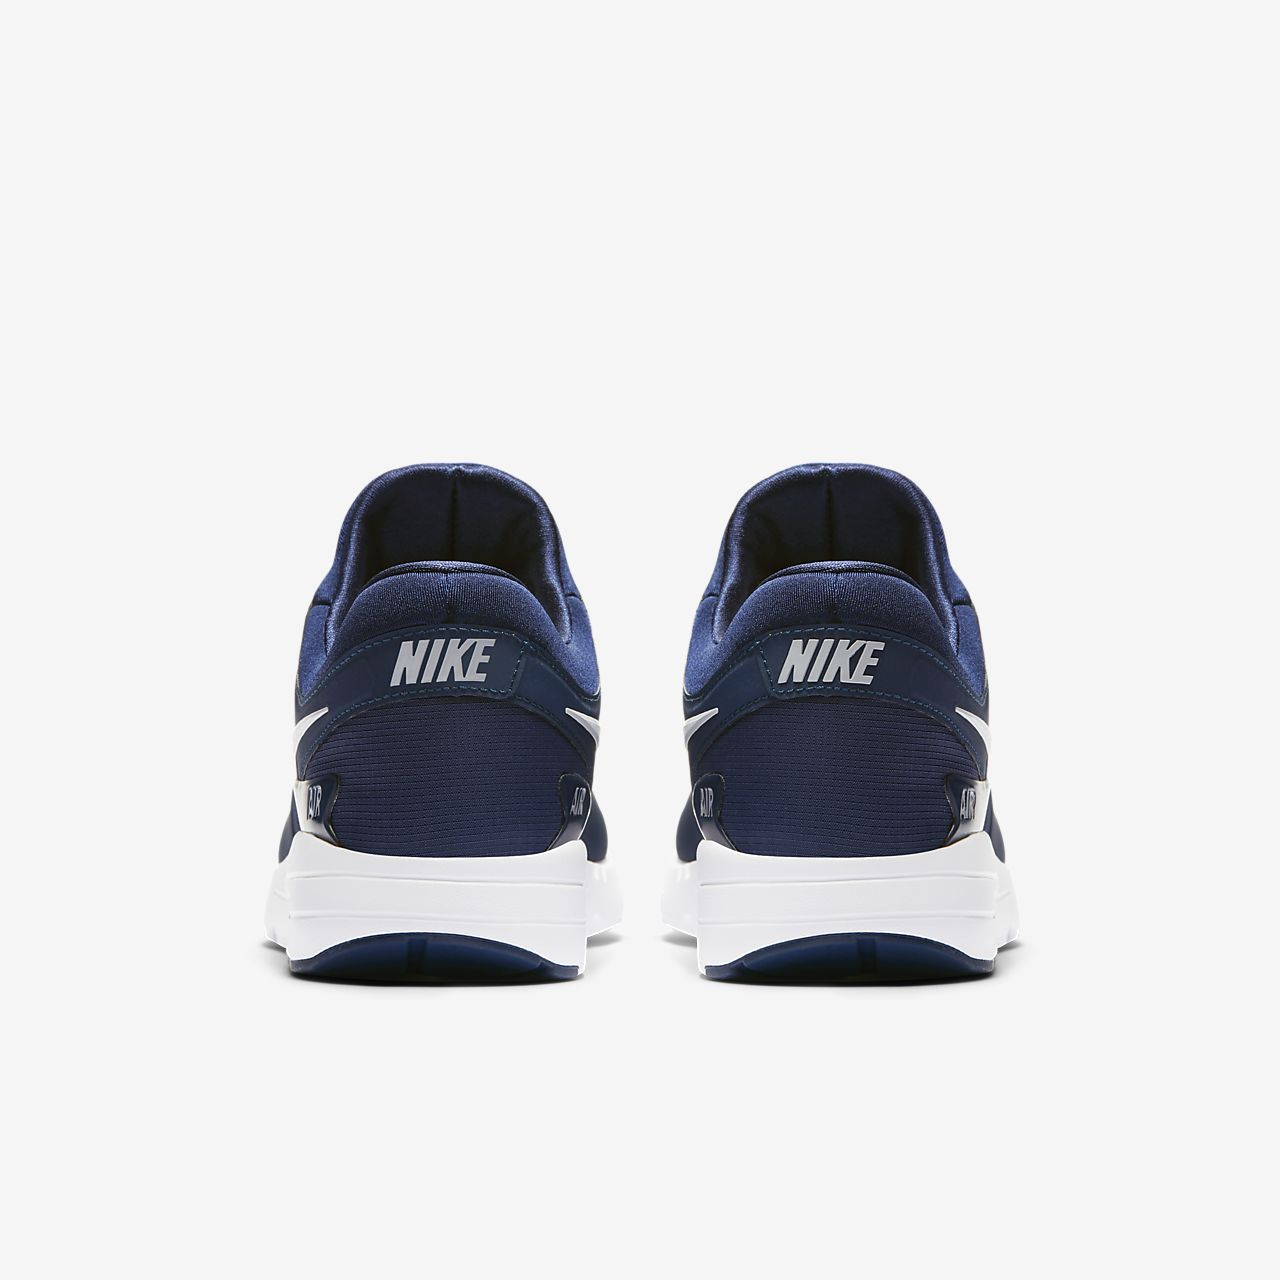 pretty nice 734a0 ef687 ... Nike Air Max Zero Essential Herenschoen